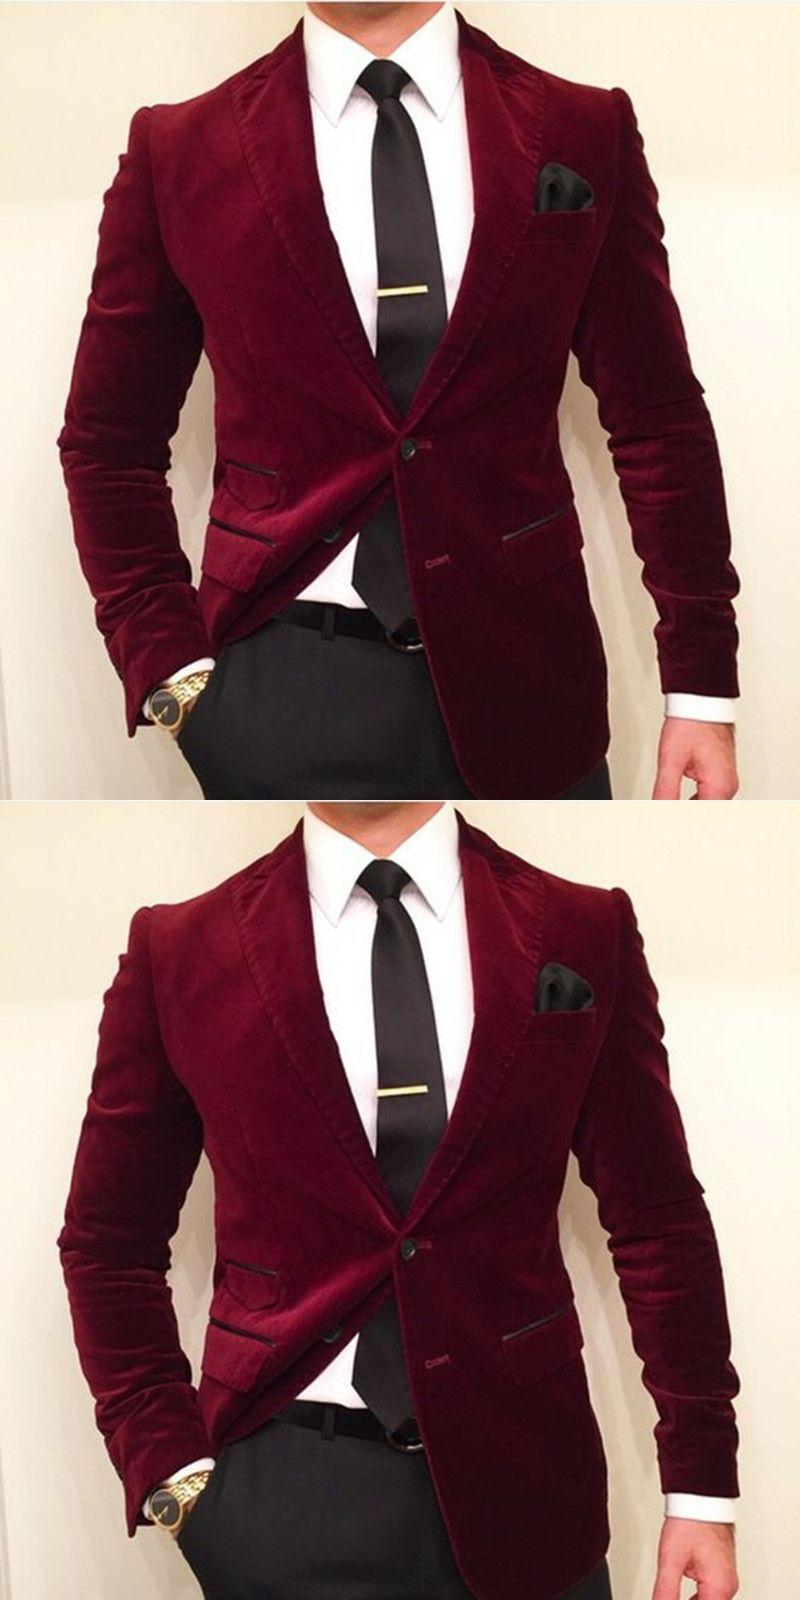 263bfbd6705 New Arrival slim fit Men Suit costume homme Vest Formal Business mens  blazer Suit wedding groom mens suits 2017 (jacket+pants)  Menssuits